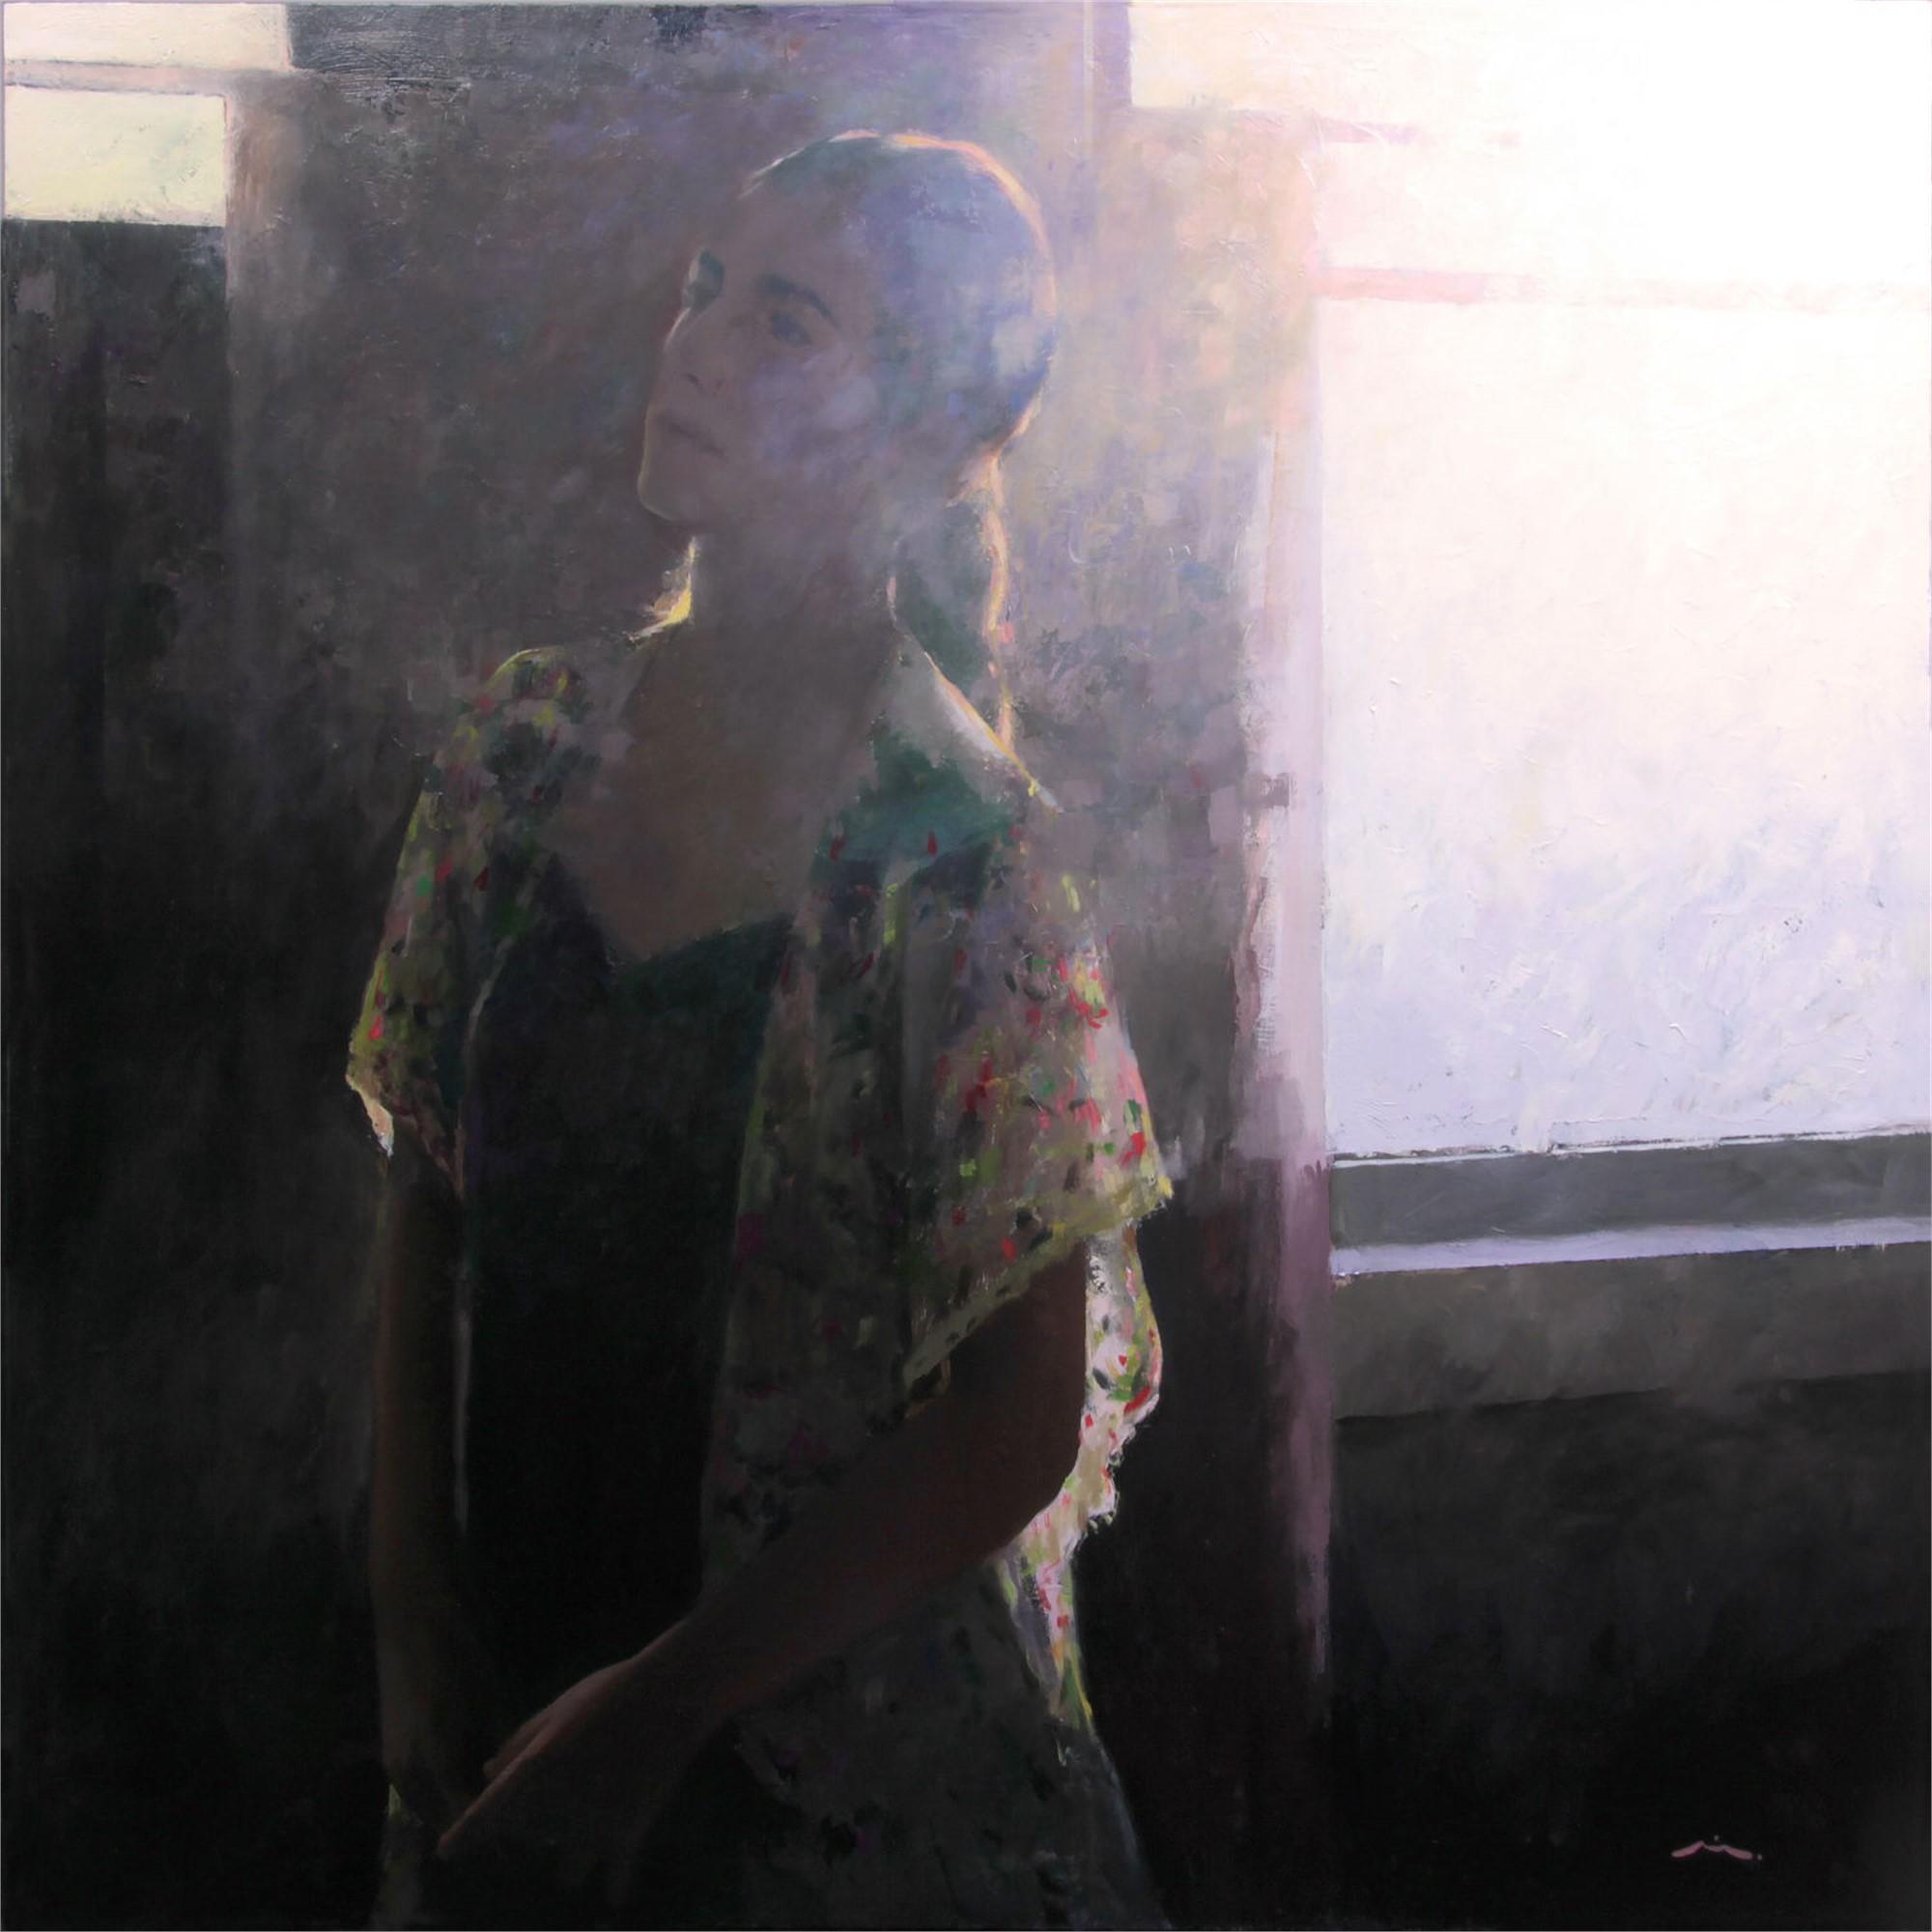 Following by Mia Bergeron